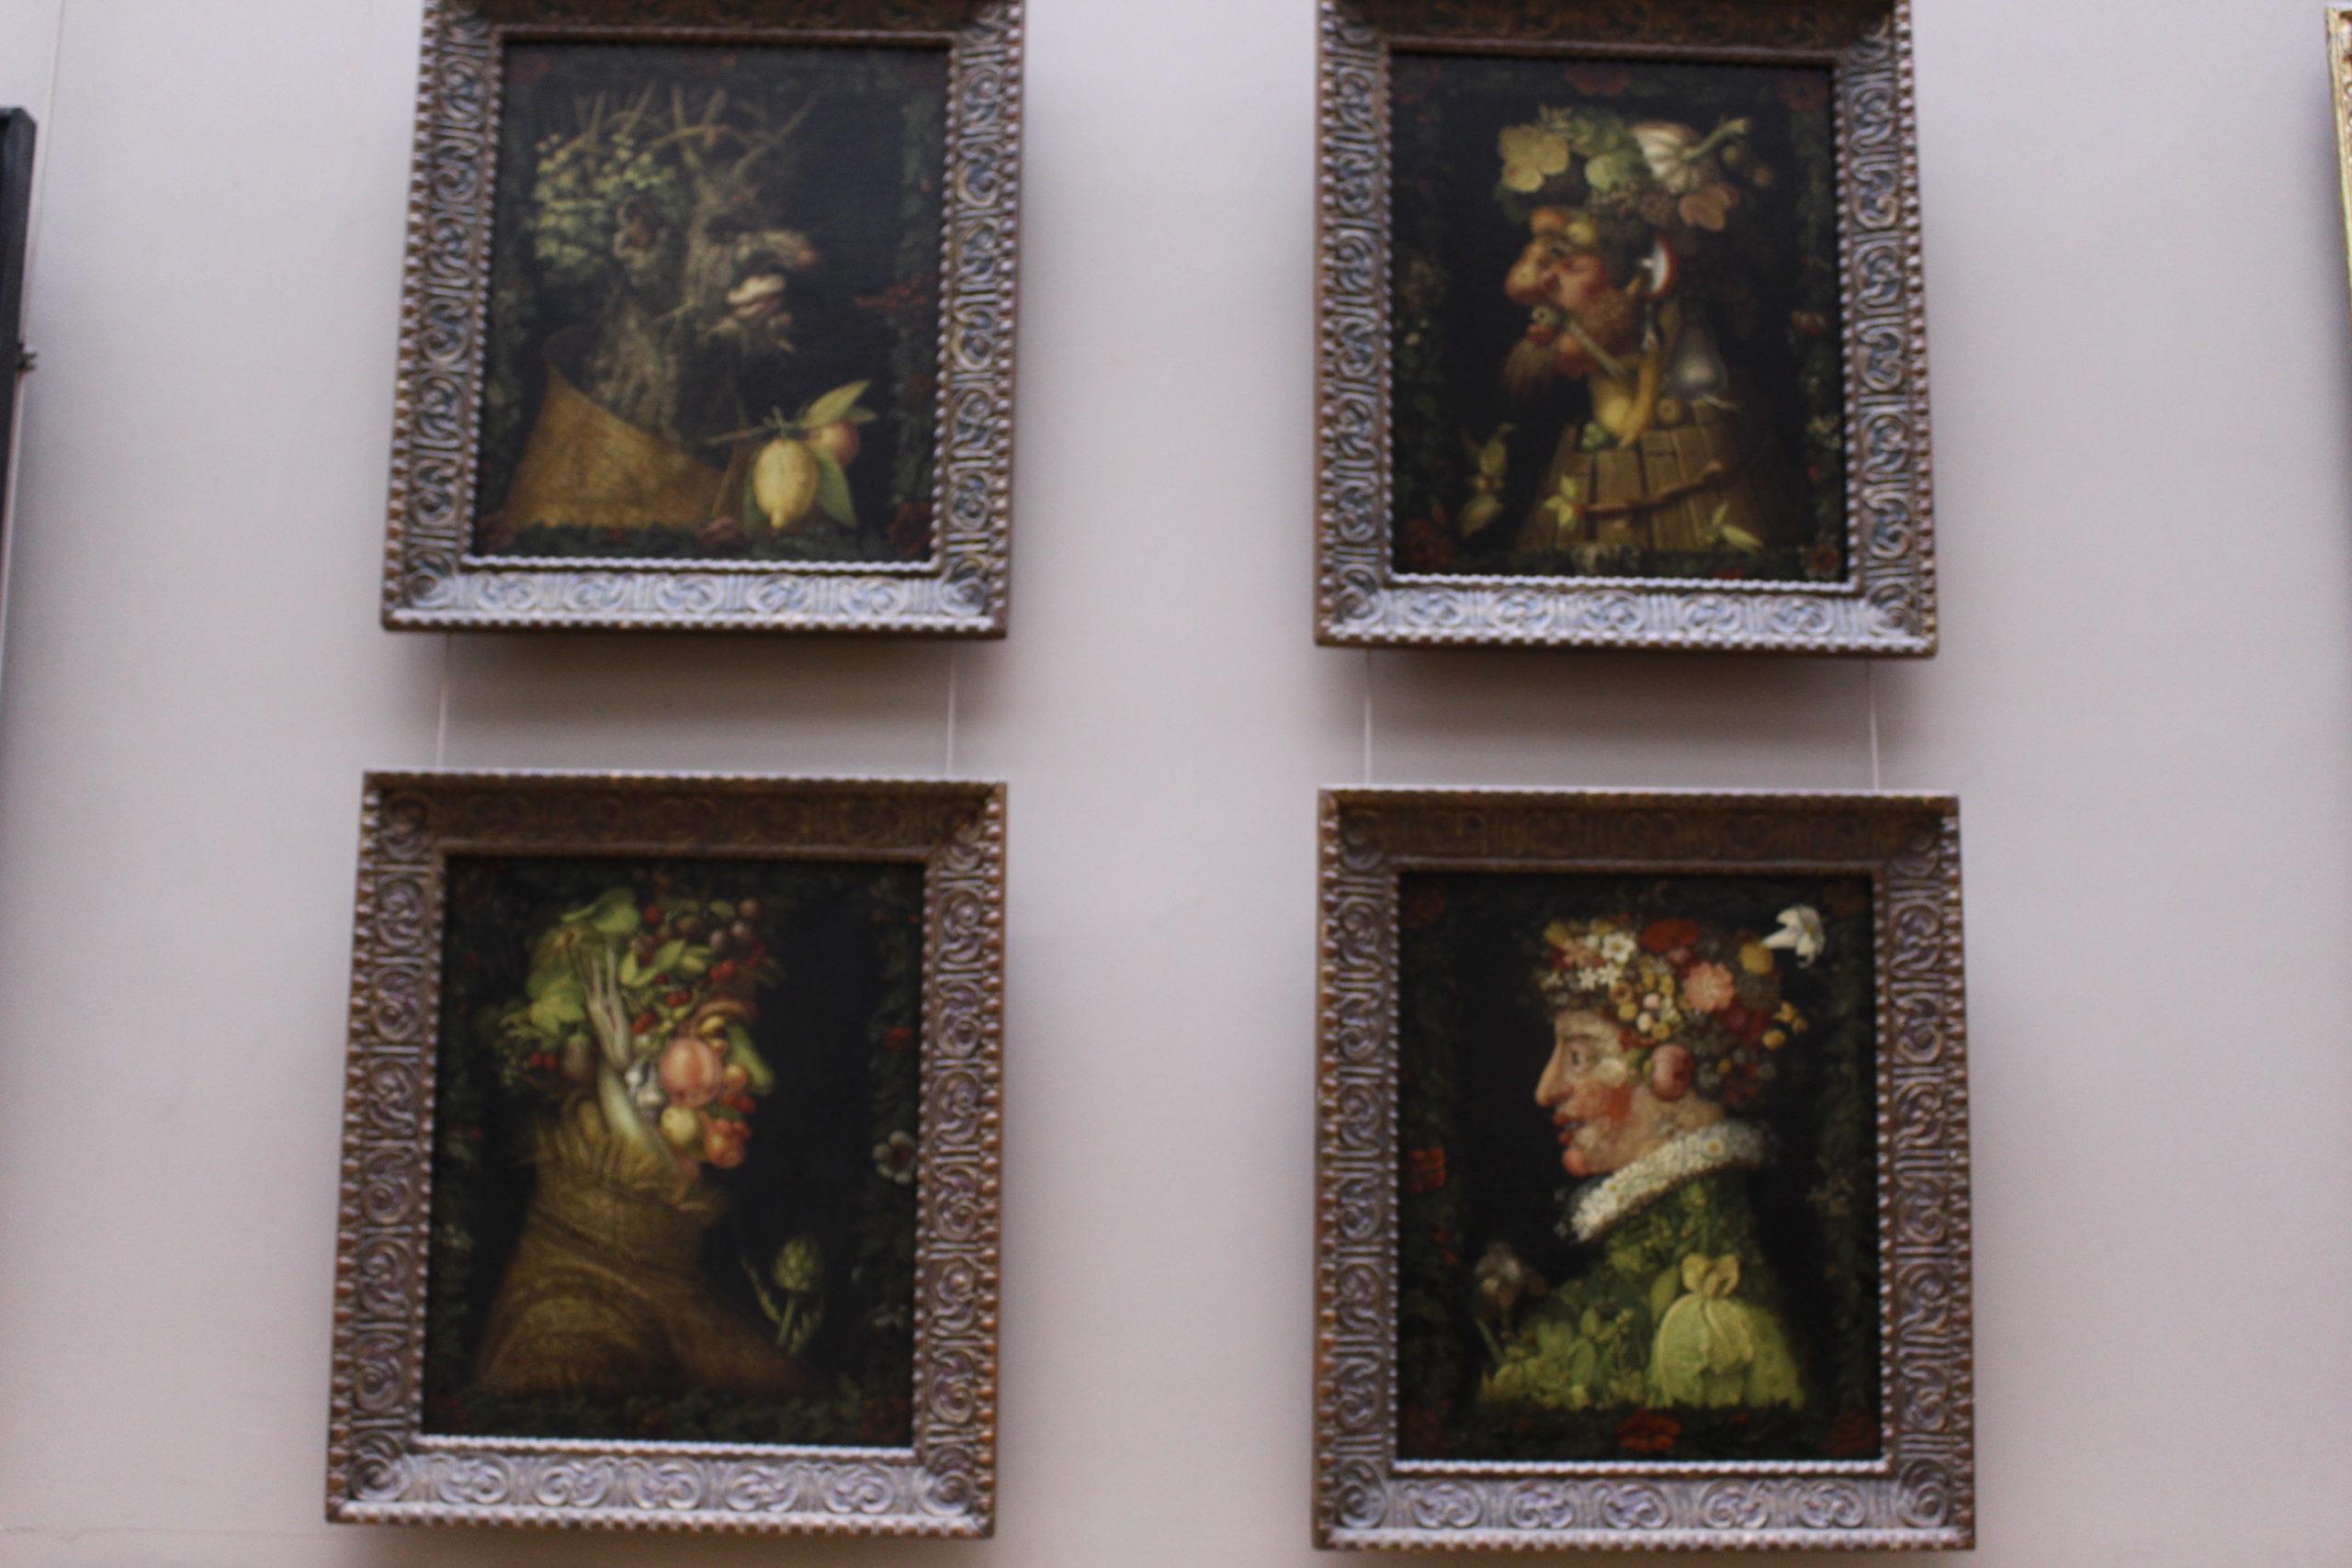 Giuseppe Arcimboldo 3 - Louvre